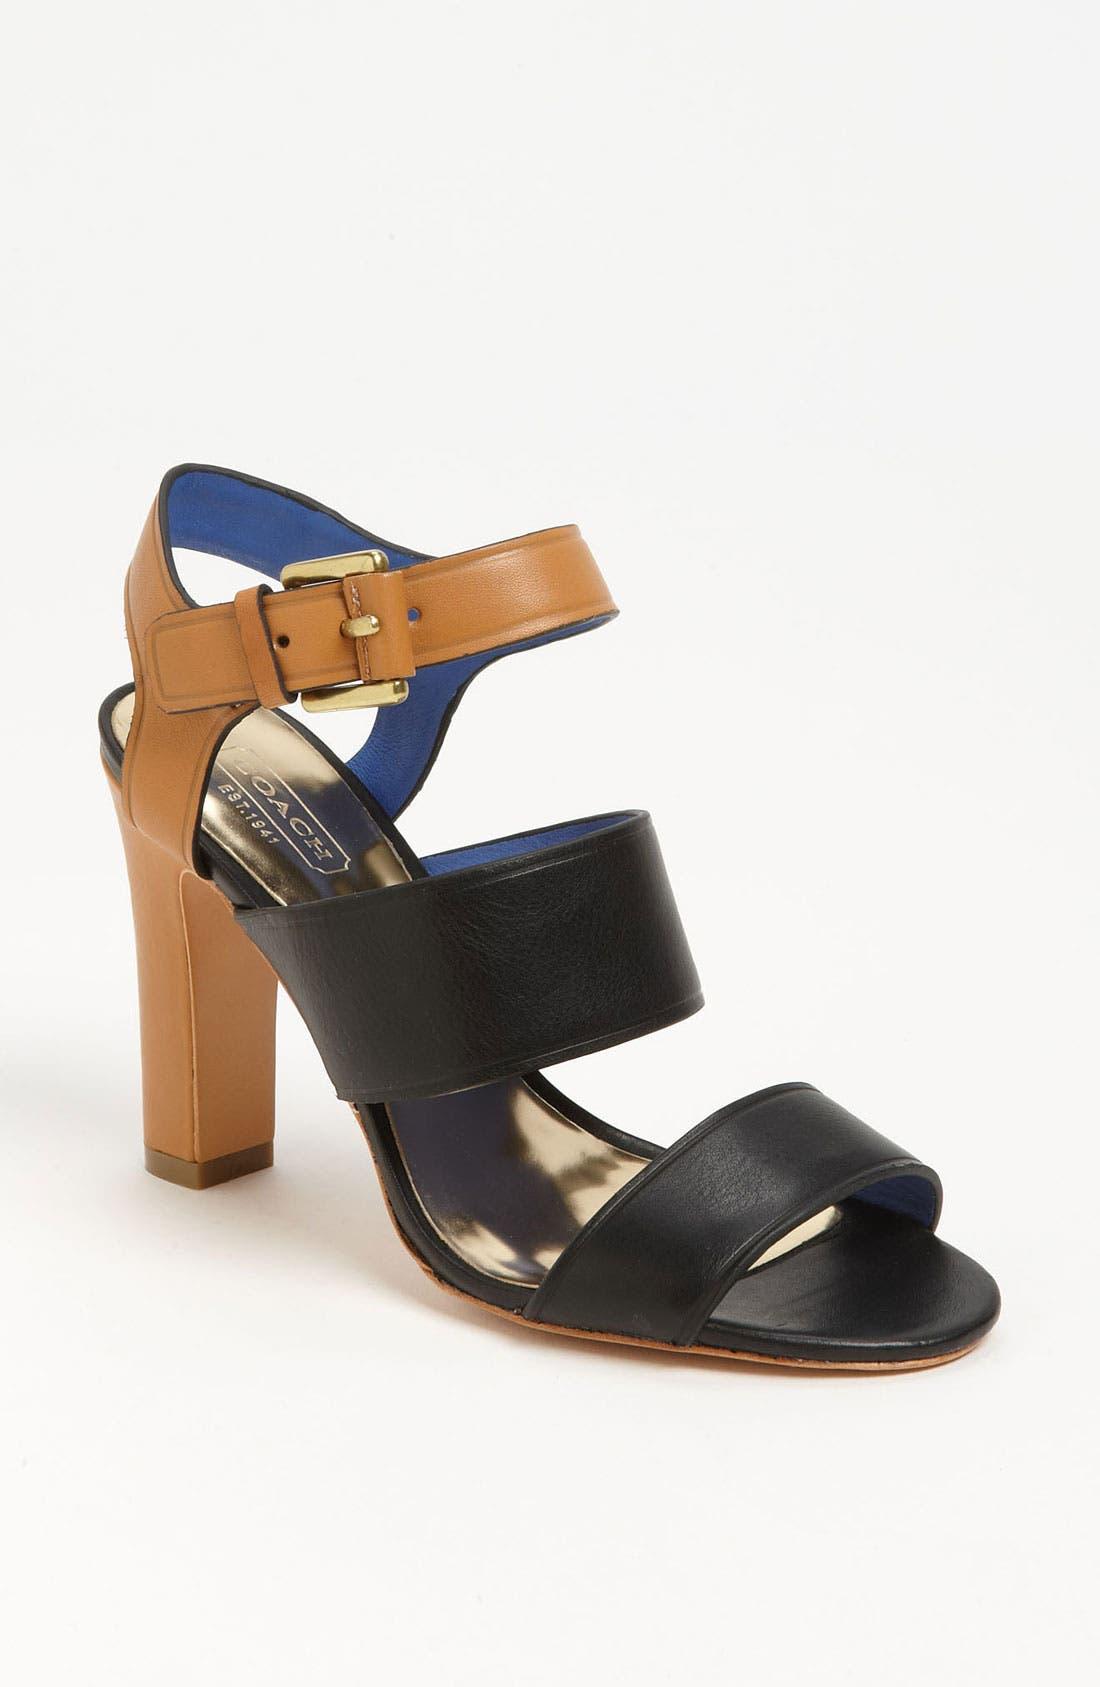 Alternate Image 1 Selected - COACH 'Tilly' Sandal